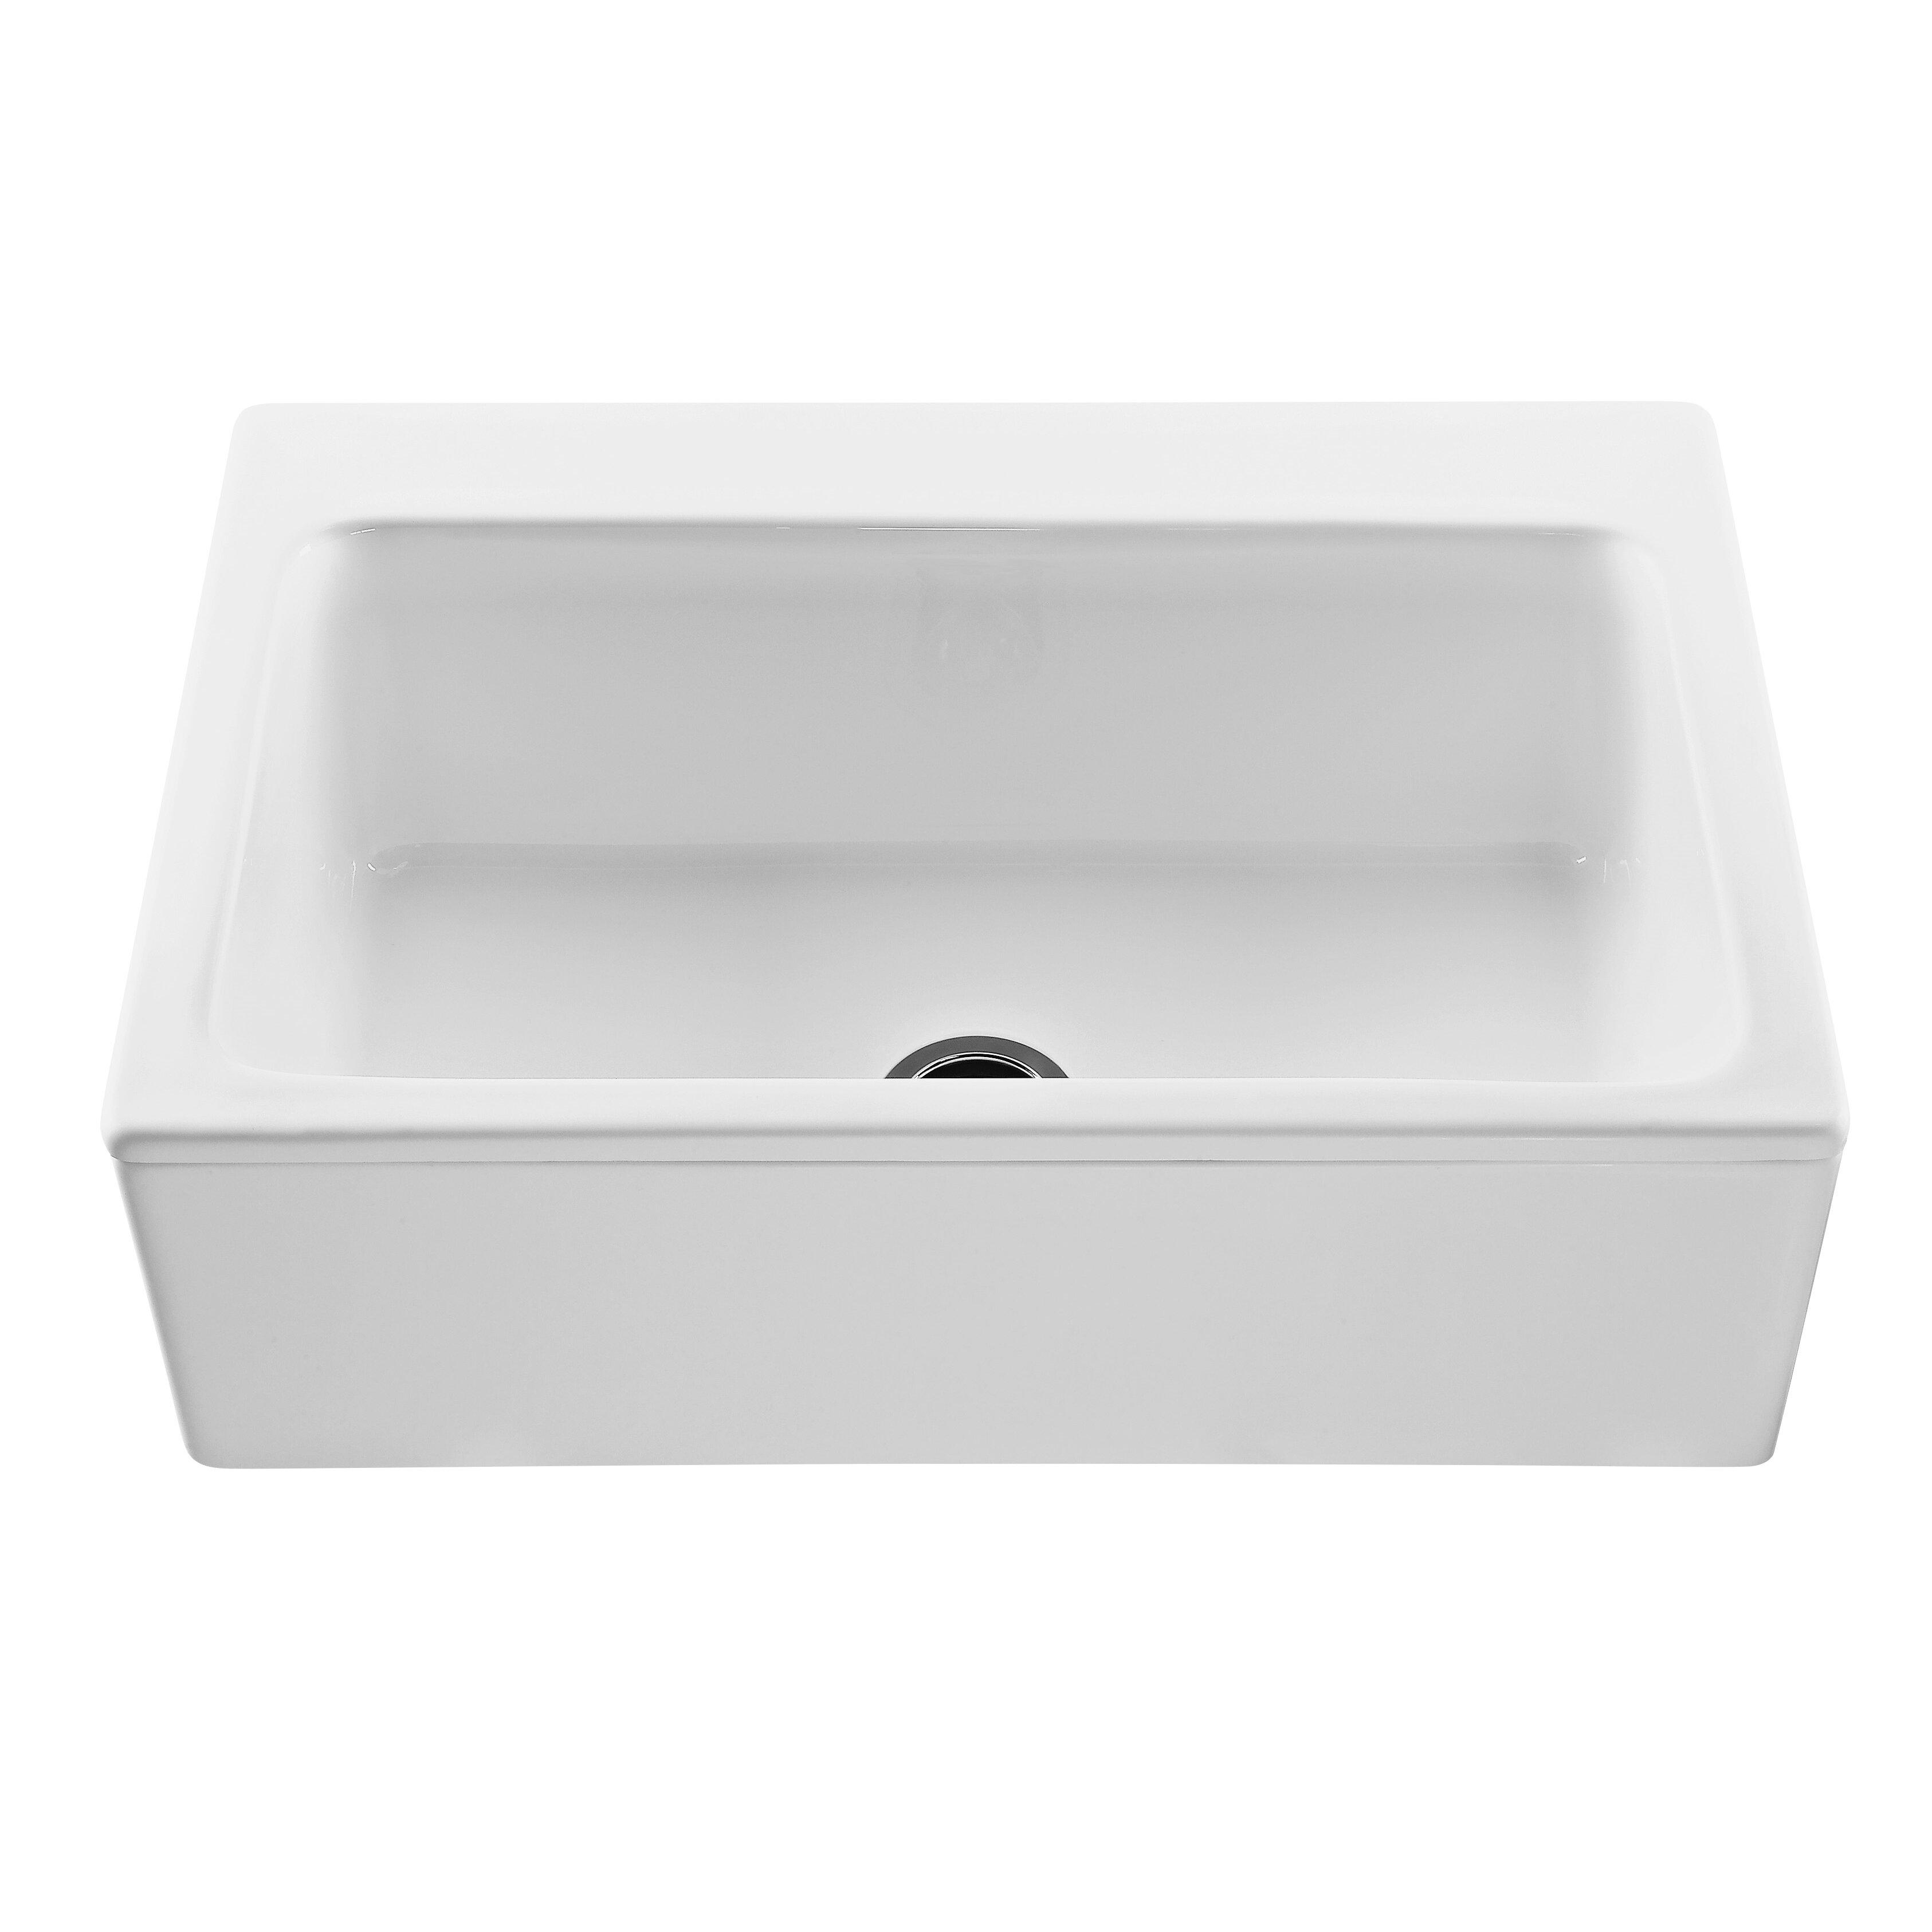 White apron kitchen - White Apron Kitchen Sink Reliance Whirlpools Reliance Mccoy 33 Quot X 22 25 Quot Farmhouse